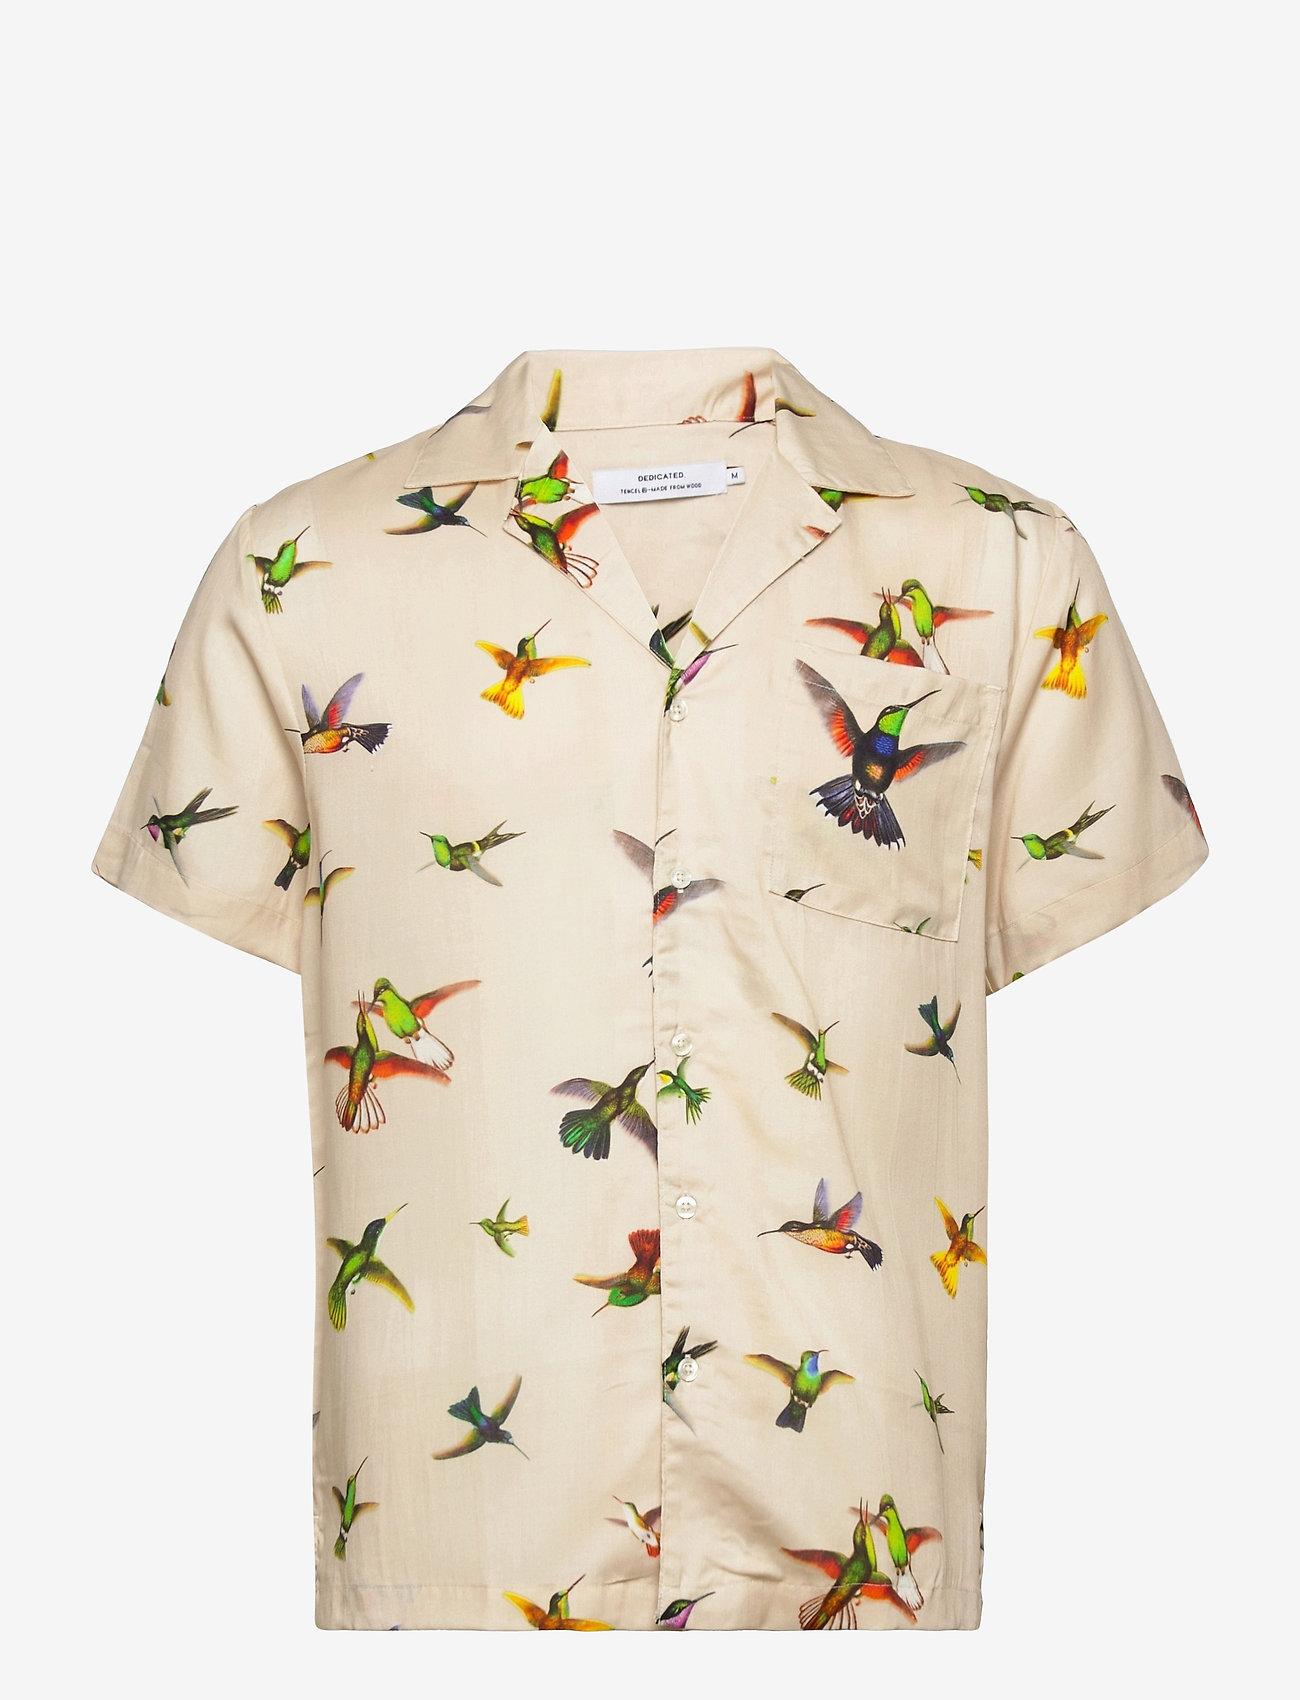 DEDICATED - Shirt Short Sleeve Marstrand Flying Hummingbirds Multi Color - geruite overhemden - multi color - 0